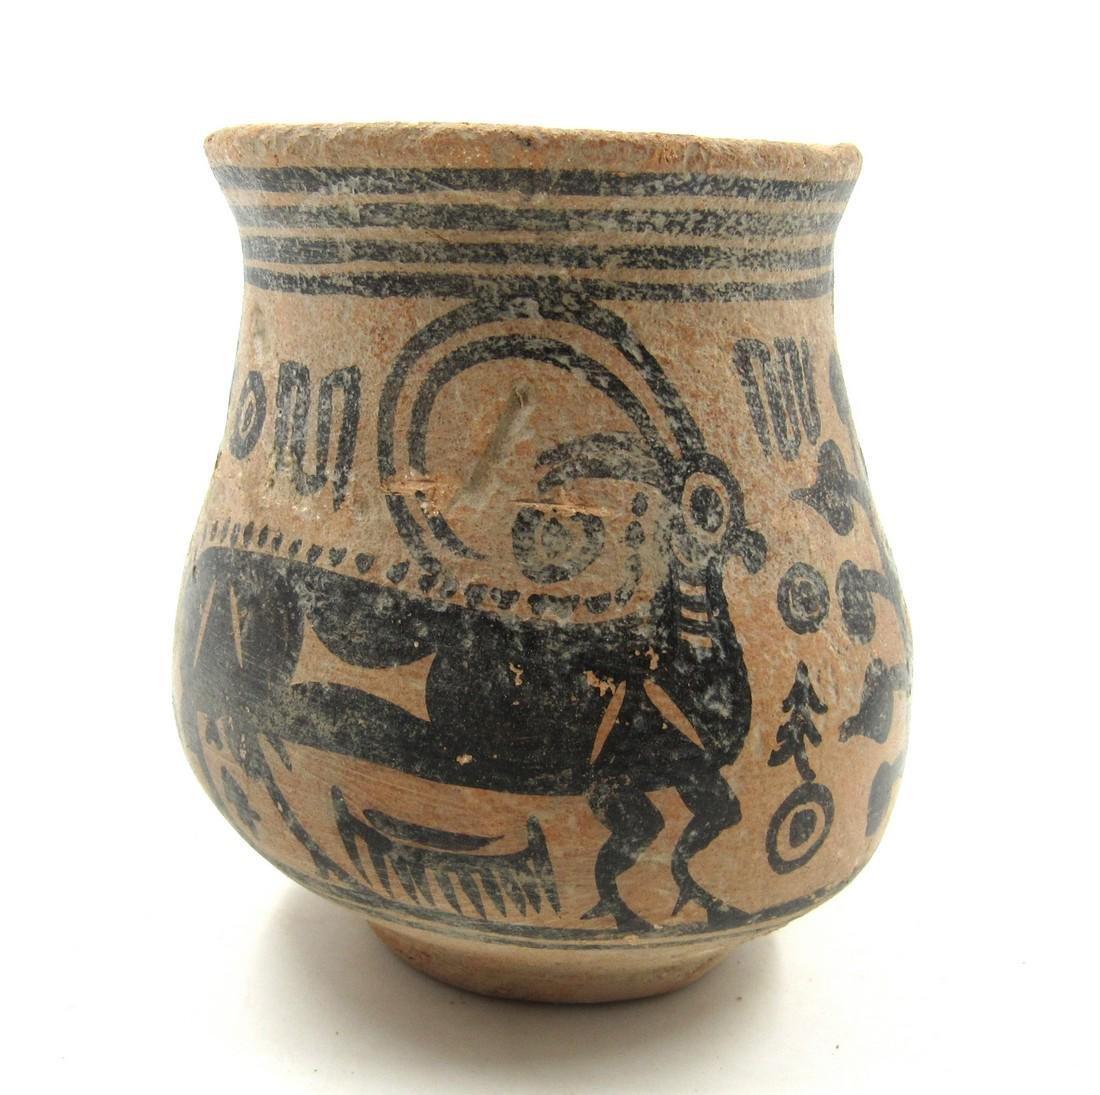 Ancient Indus Valley Terracotta Jar with Deer